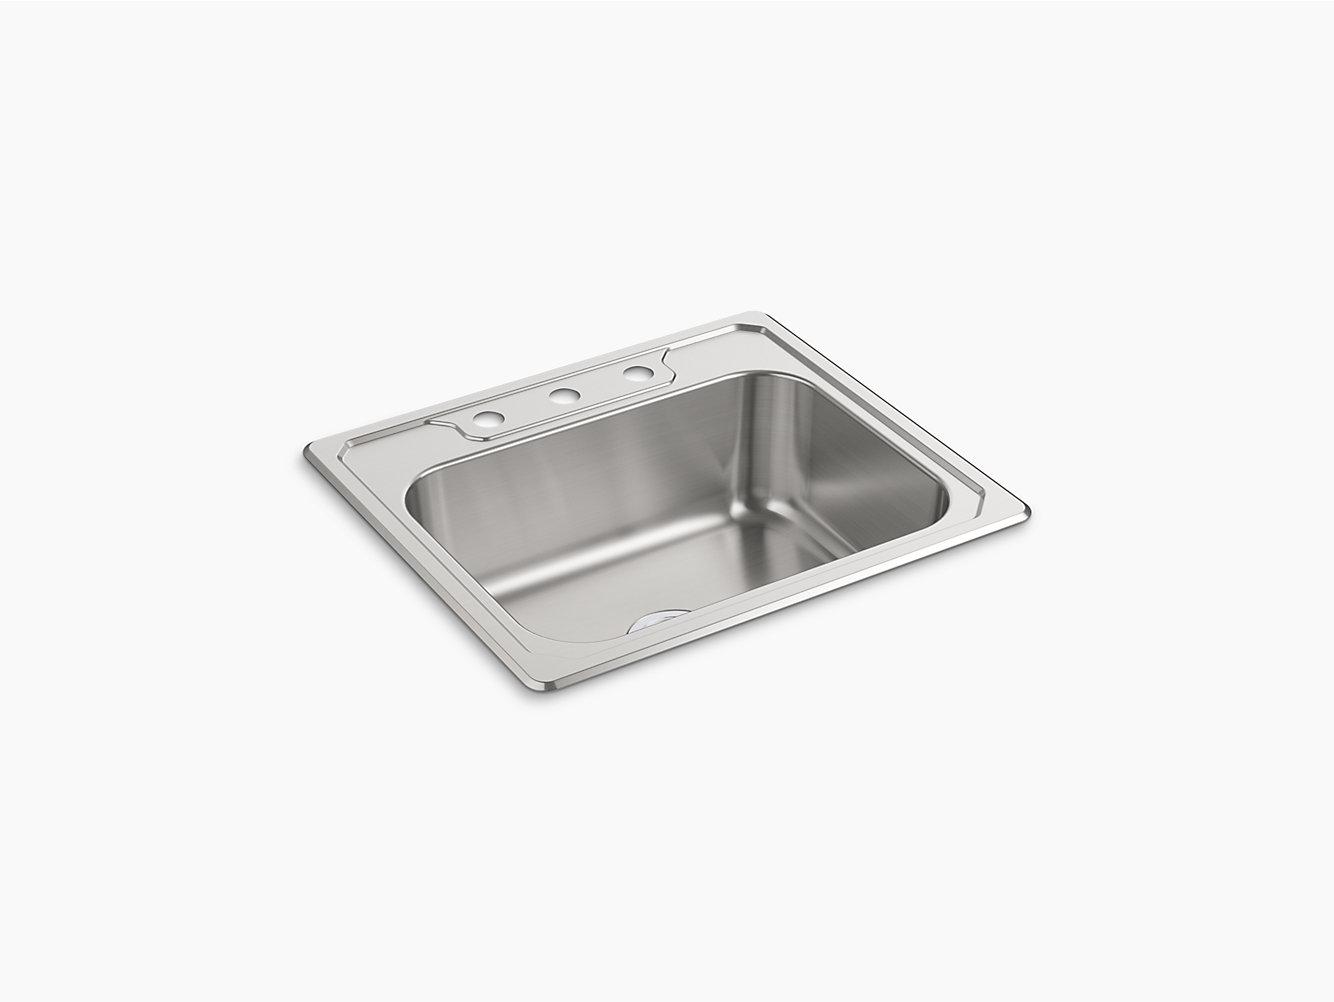 Middleton Top Mount Single Bowl Kitchen Sink 25 X 22 8 14711 3 Na Sterling